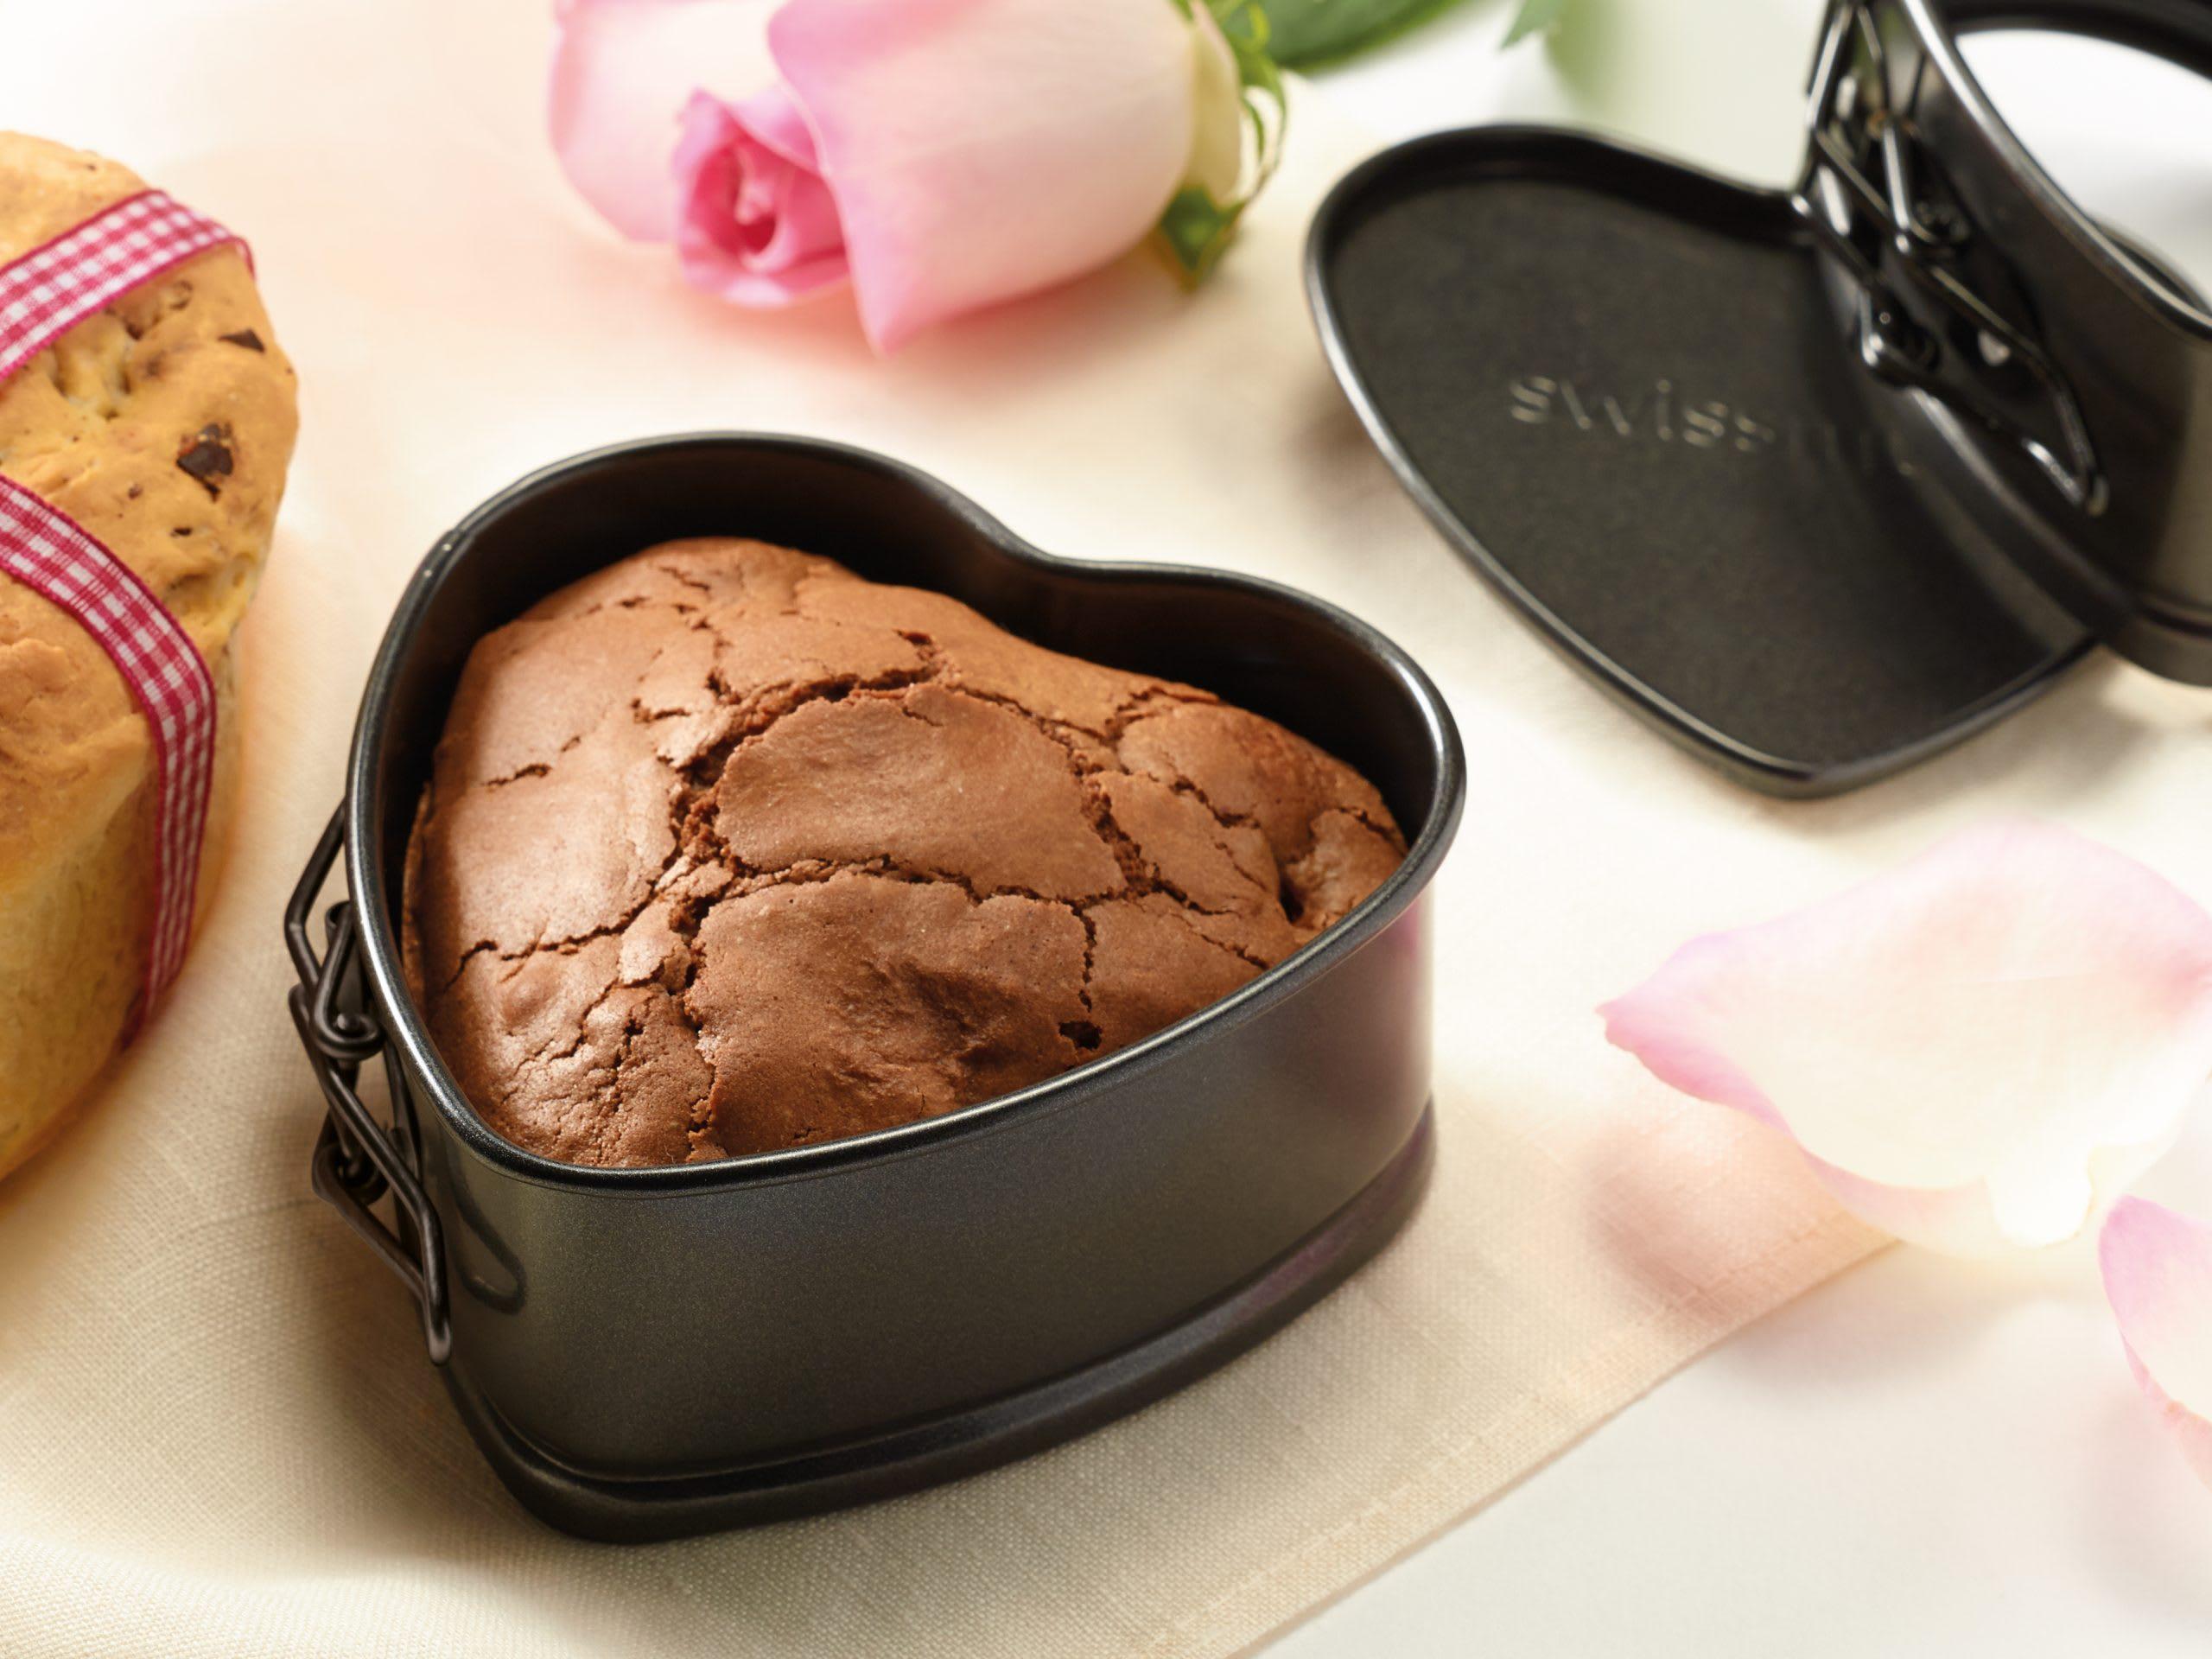 Coeurs au chocolat